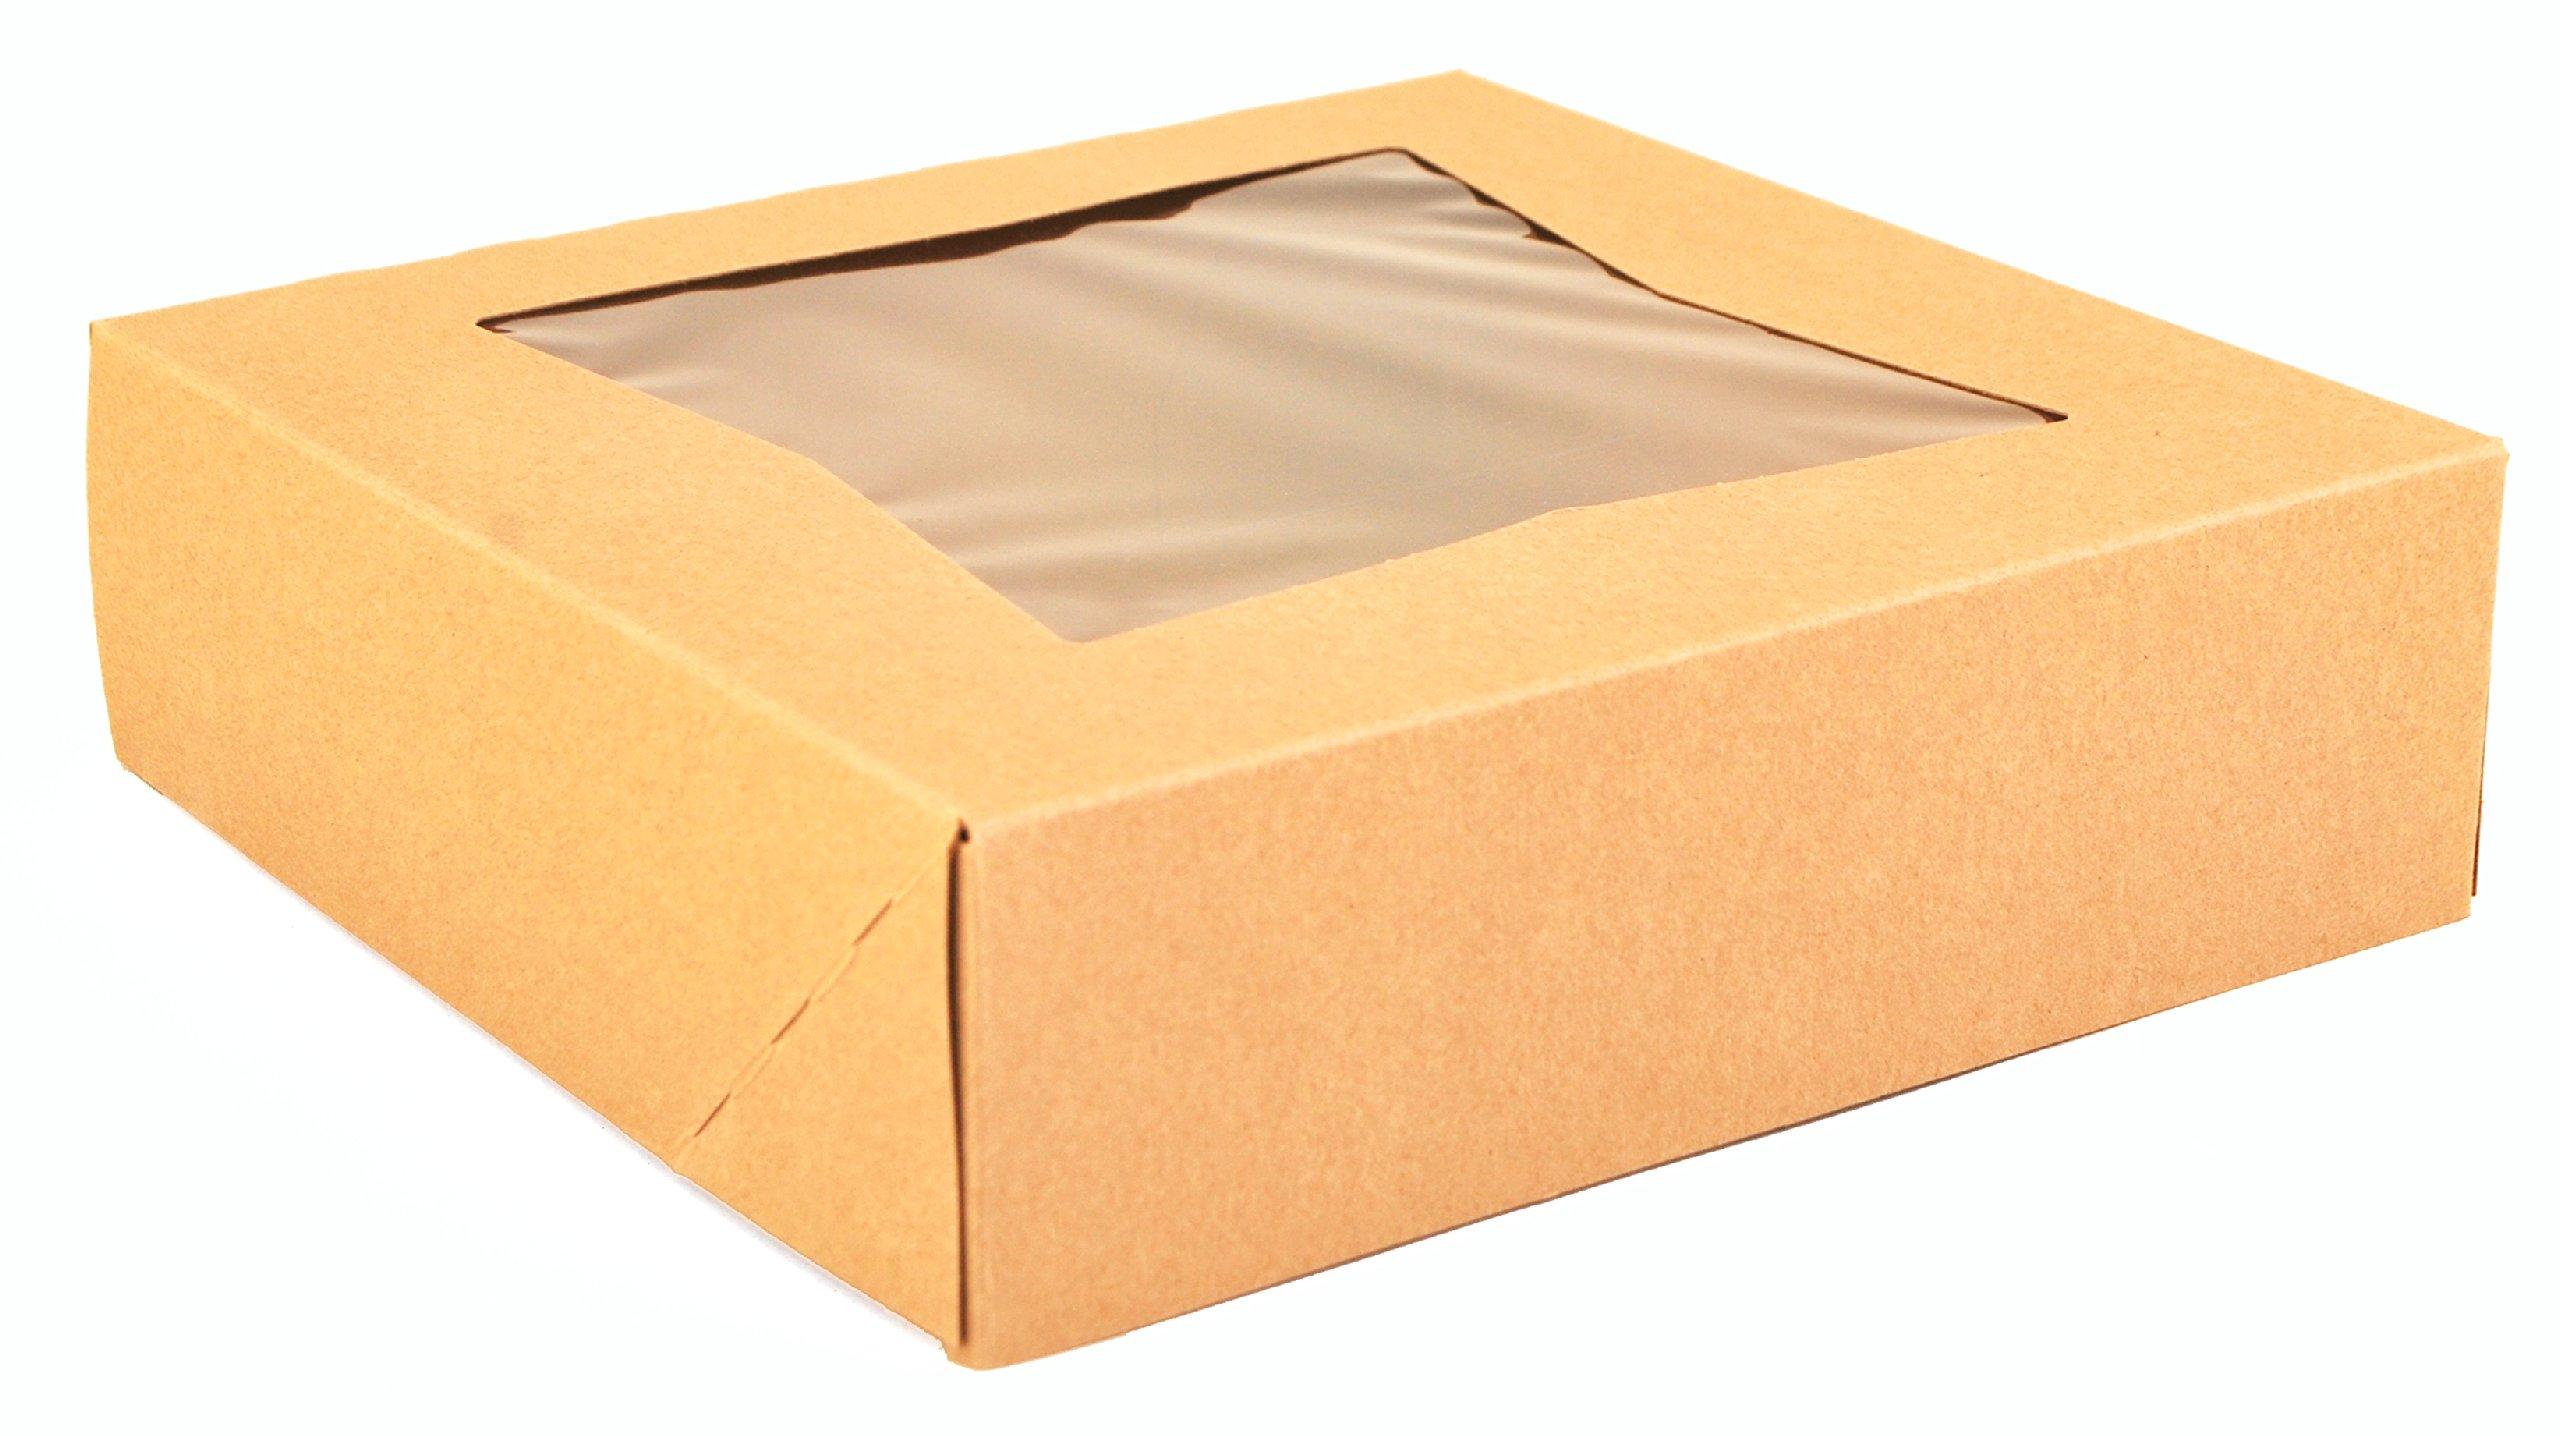 Southern Champion Tray 24133K Kraft Paperboard Window Bakery Box, 9'' Length x 9'' Width x 2-1/2'' Height (Case of 200)